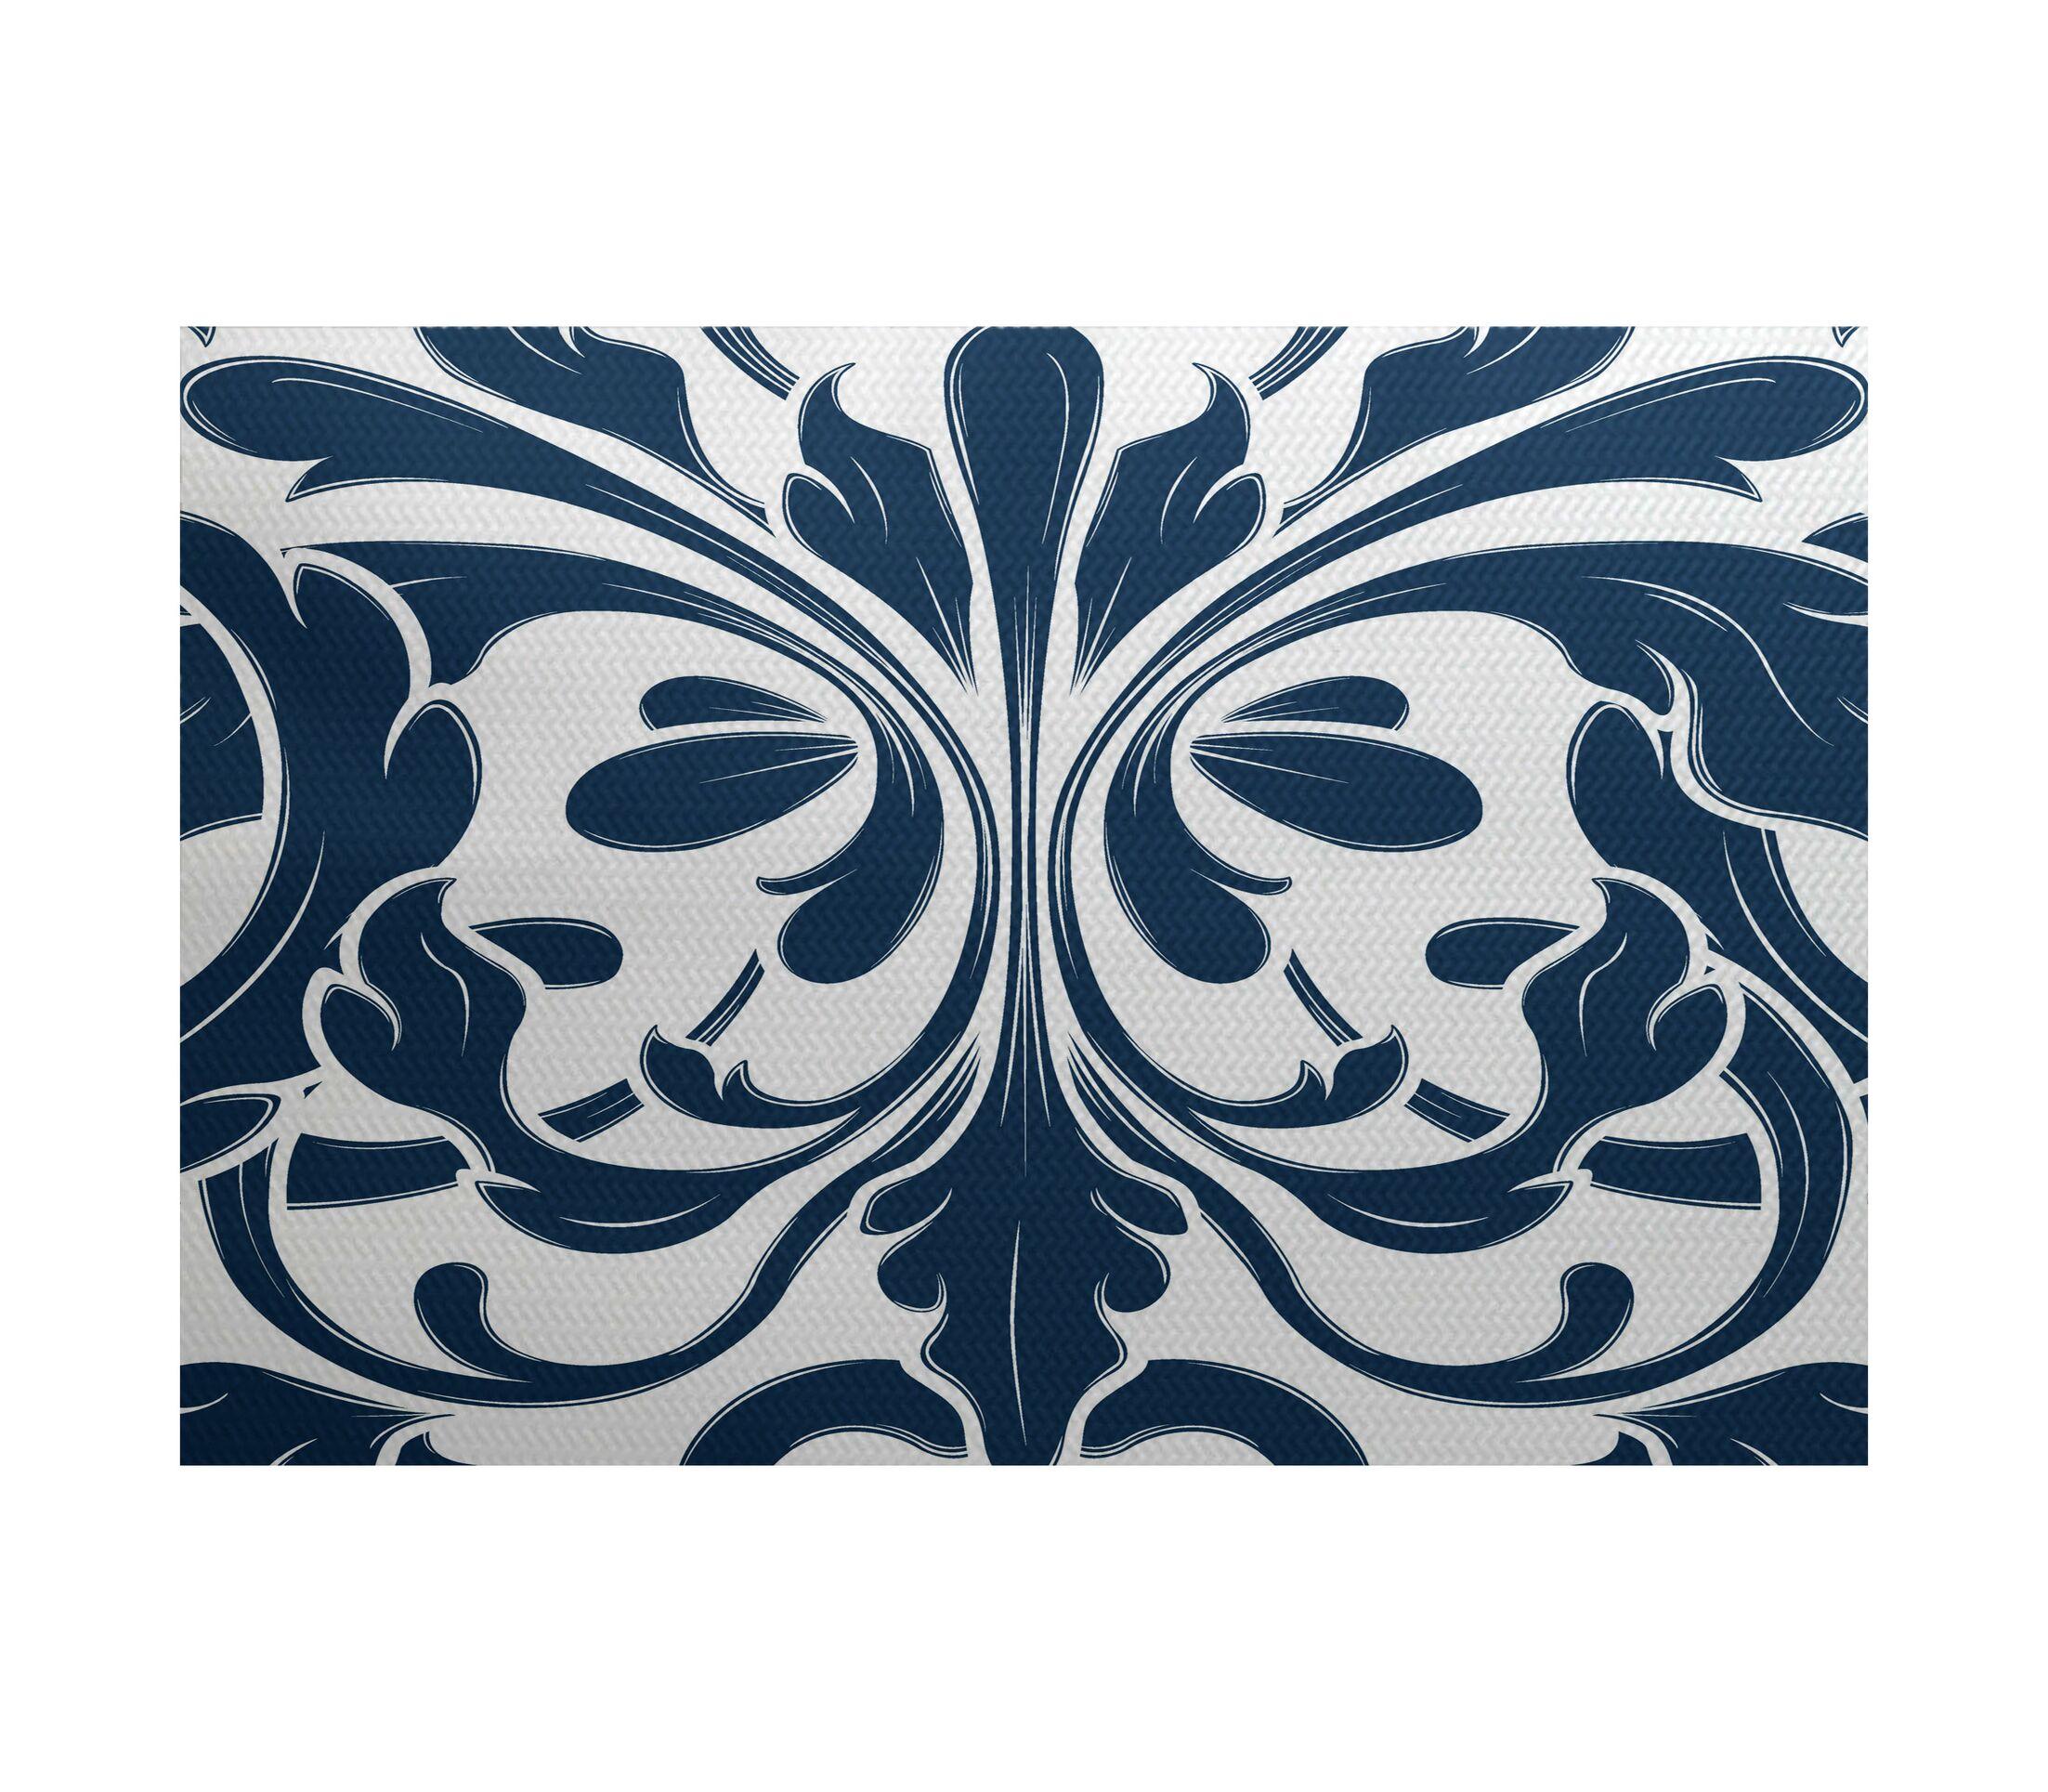 Rhymer Blue Indoor/Outdoor Area Rug Rug Size: Rectangle 5' x 7'